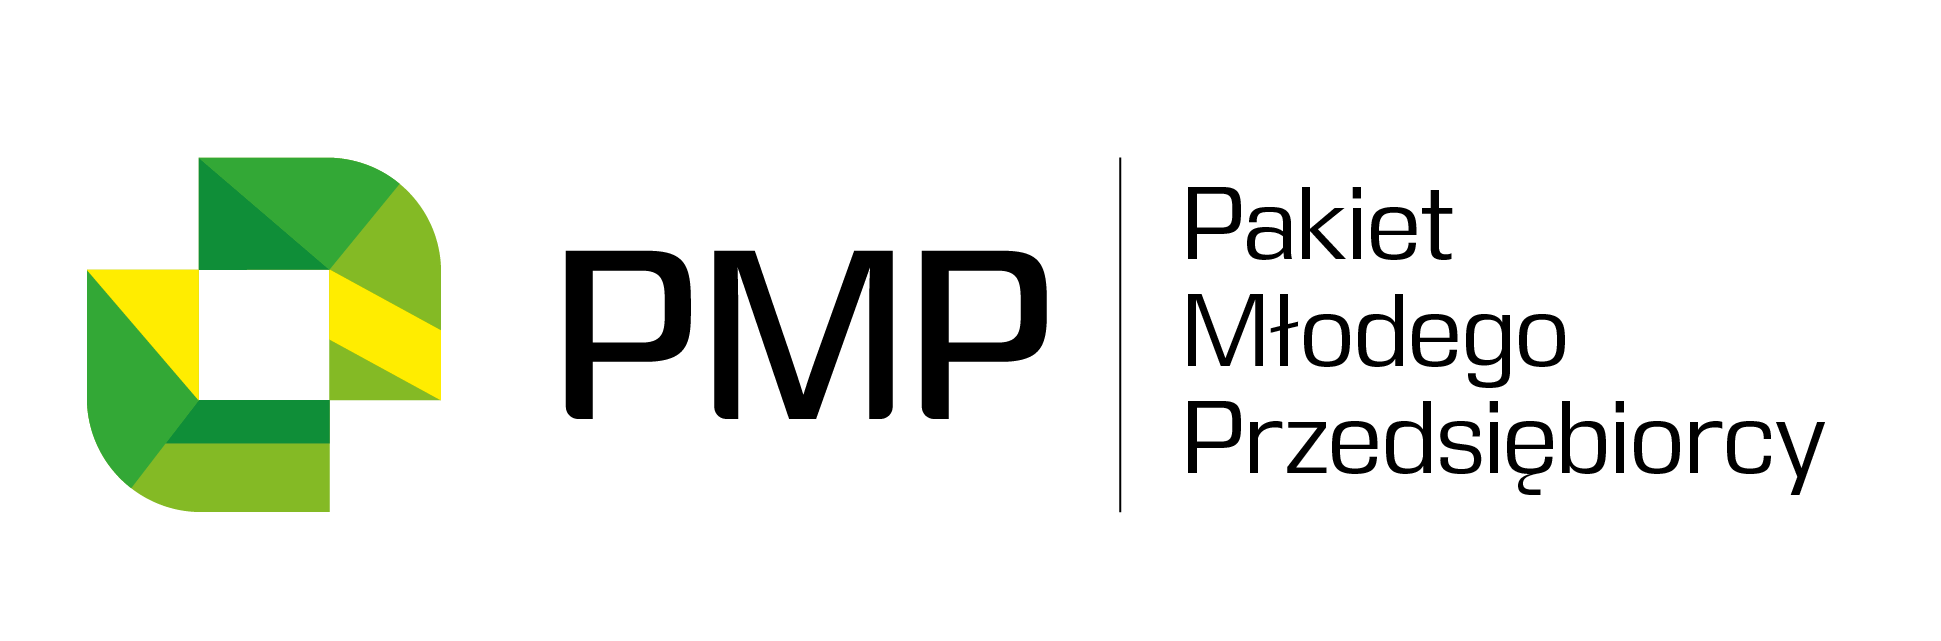 Ciemne logo